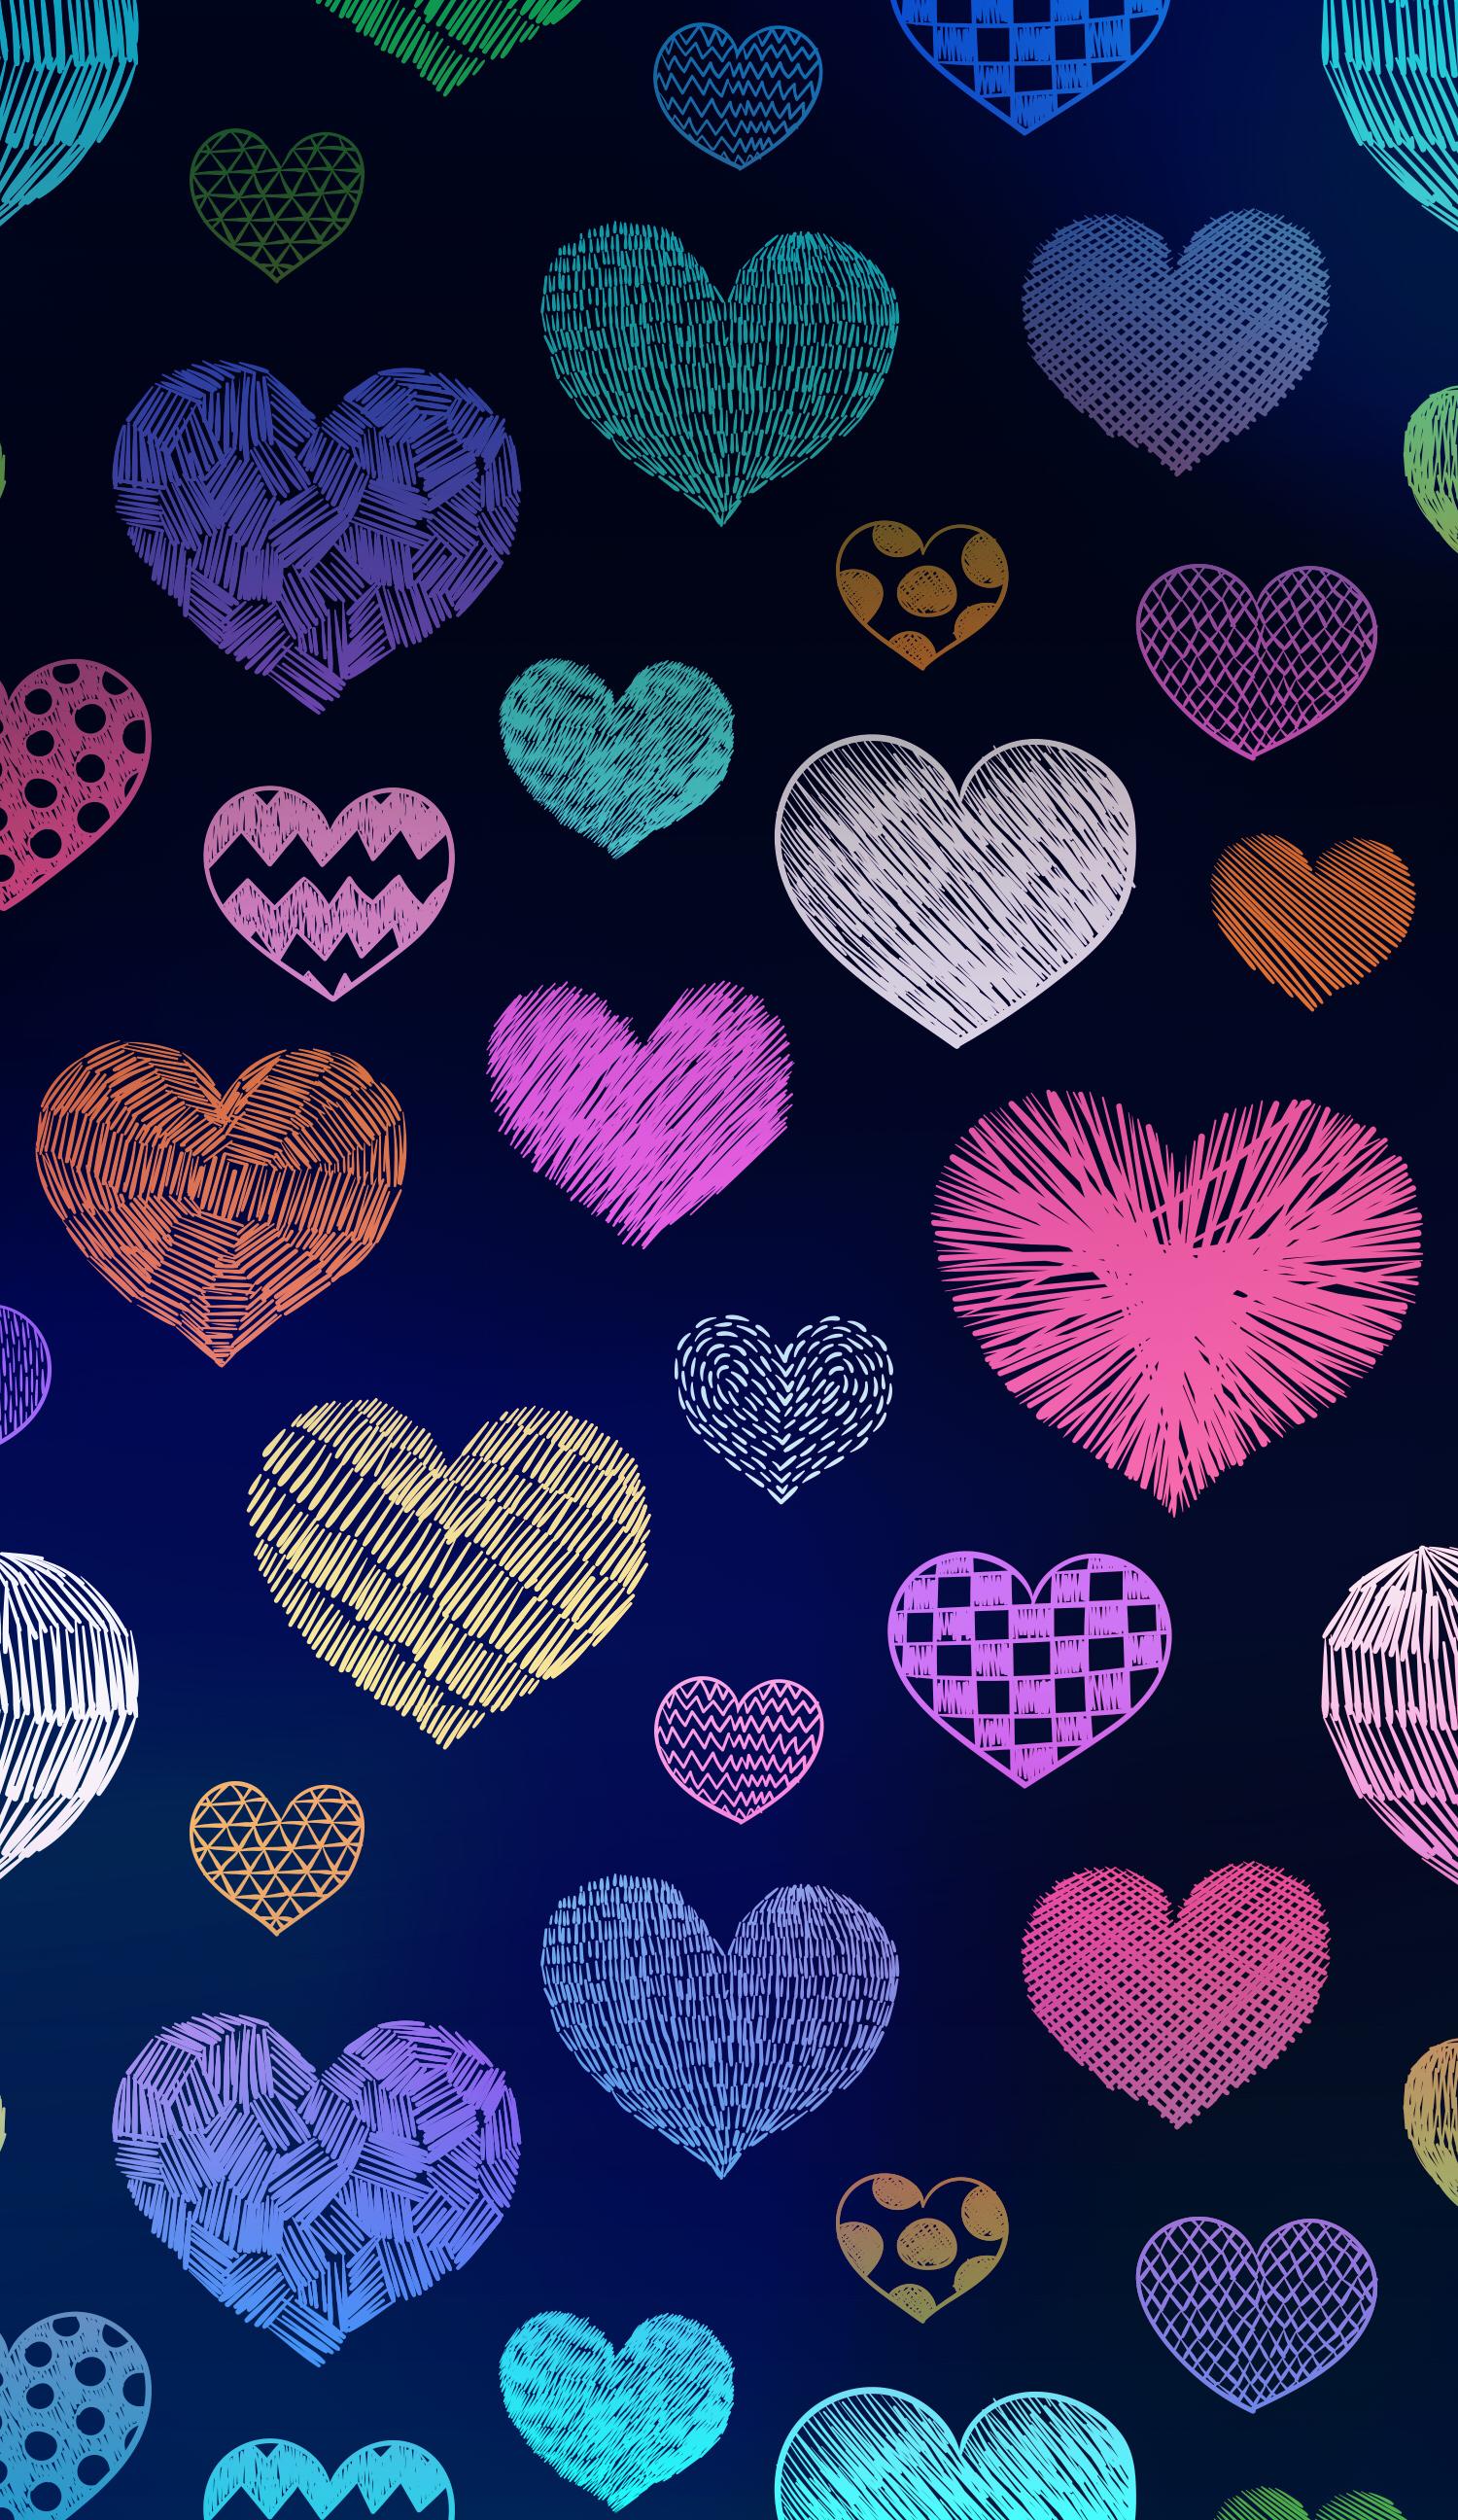 Pin By Glenda On Background Wallpaper Valentines Wallpaper Heart Wallpaper Cute Wallpaper Backgrounds